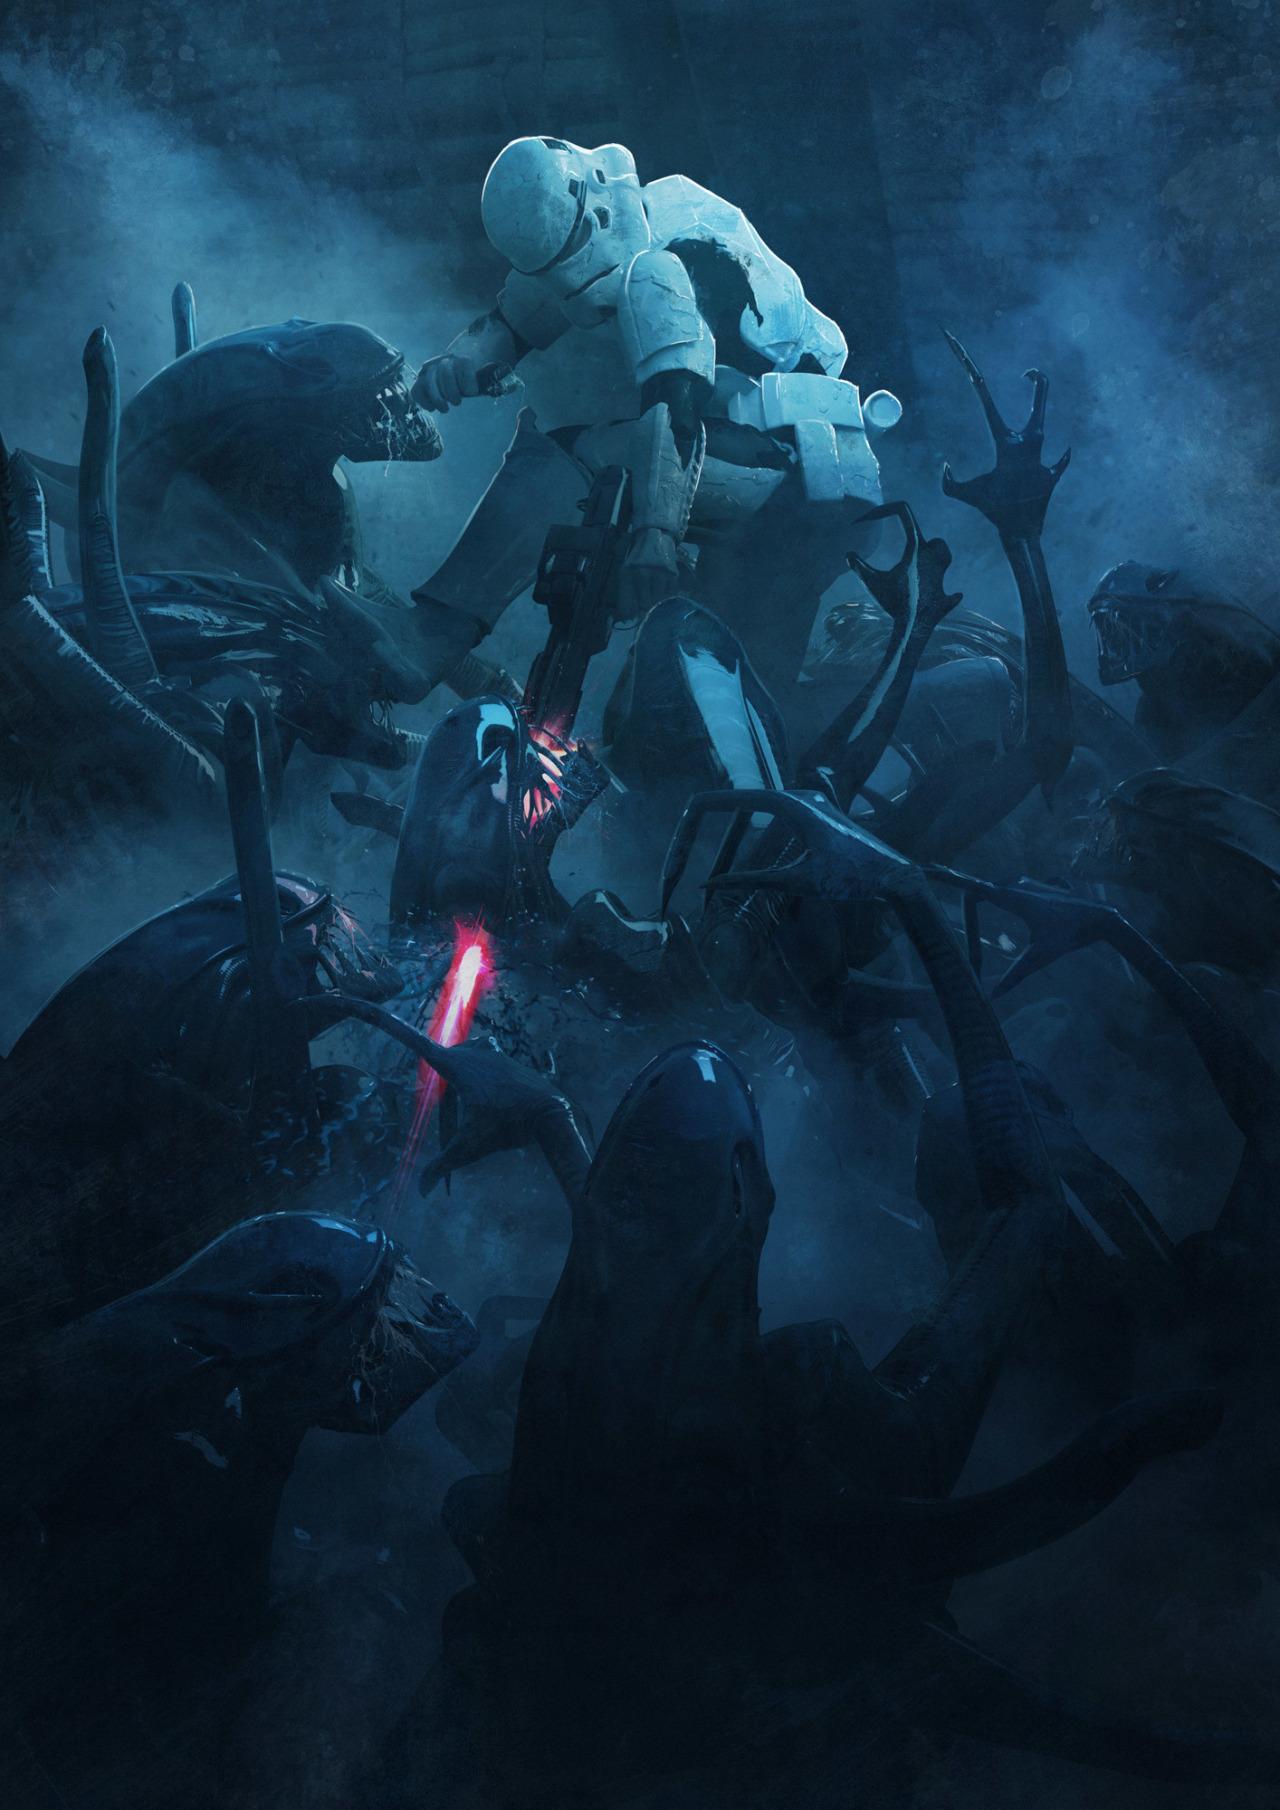 501 Stormtroopers vs Aliens by Guillem H Pongiluppi